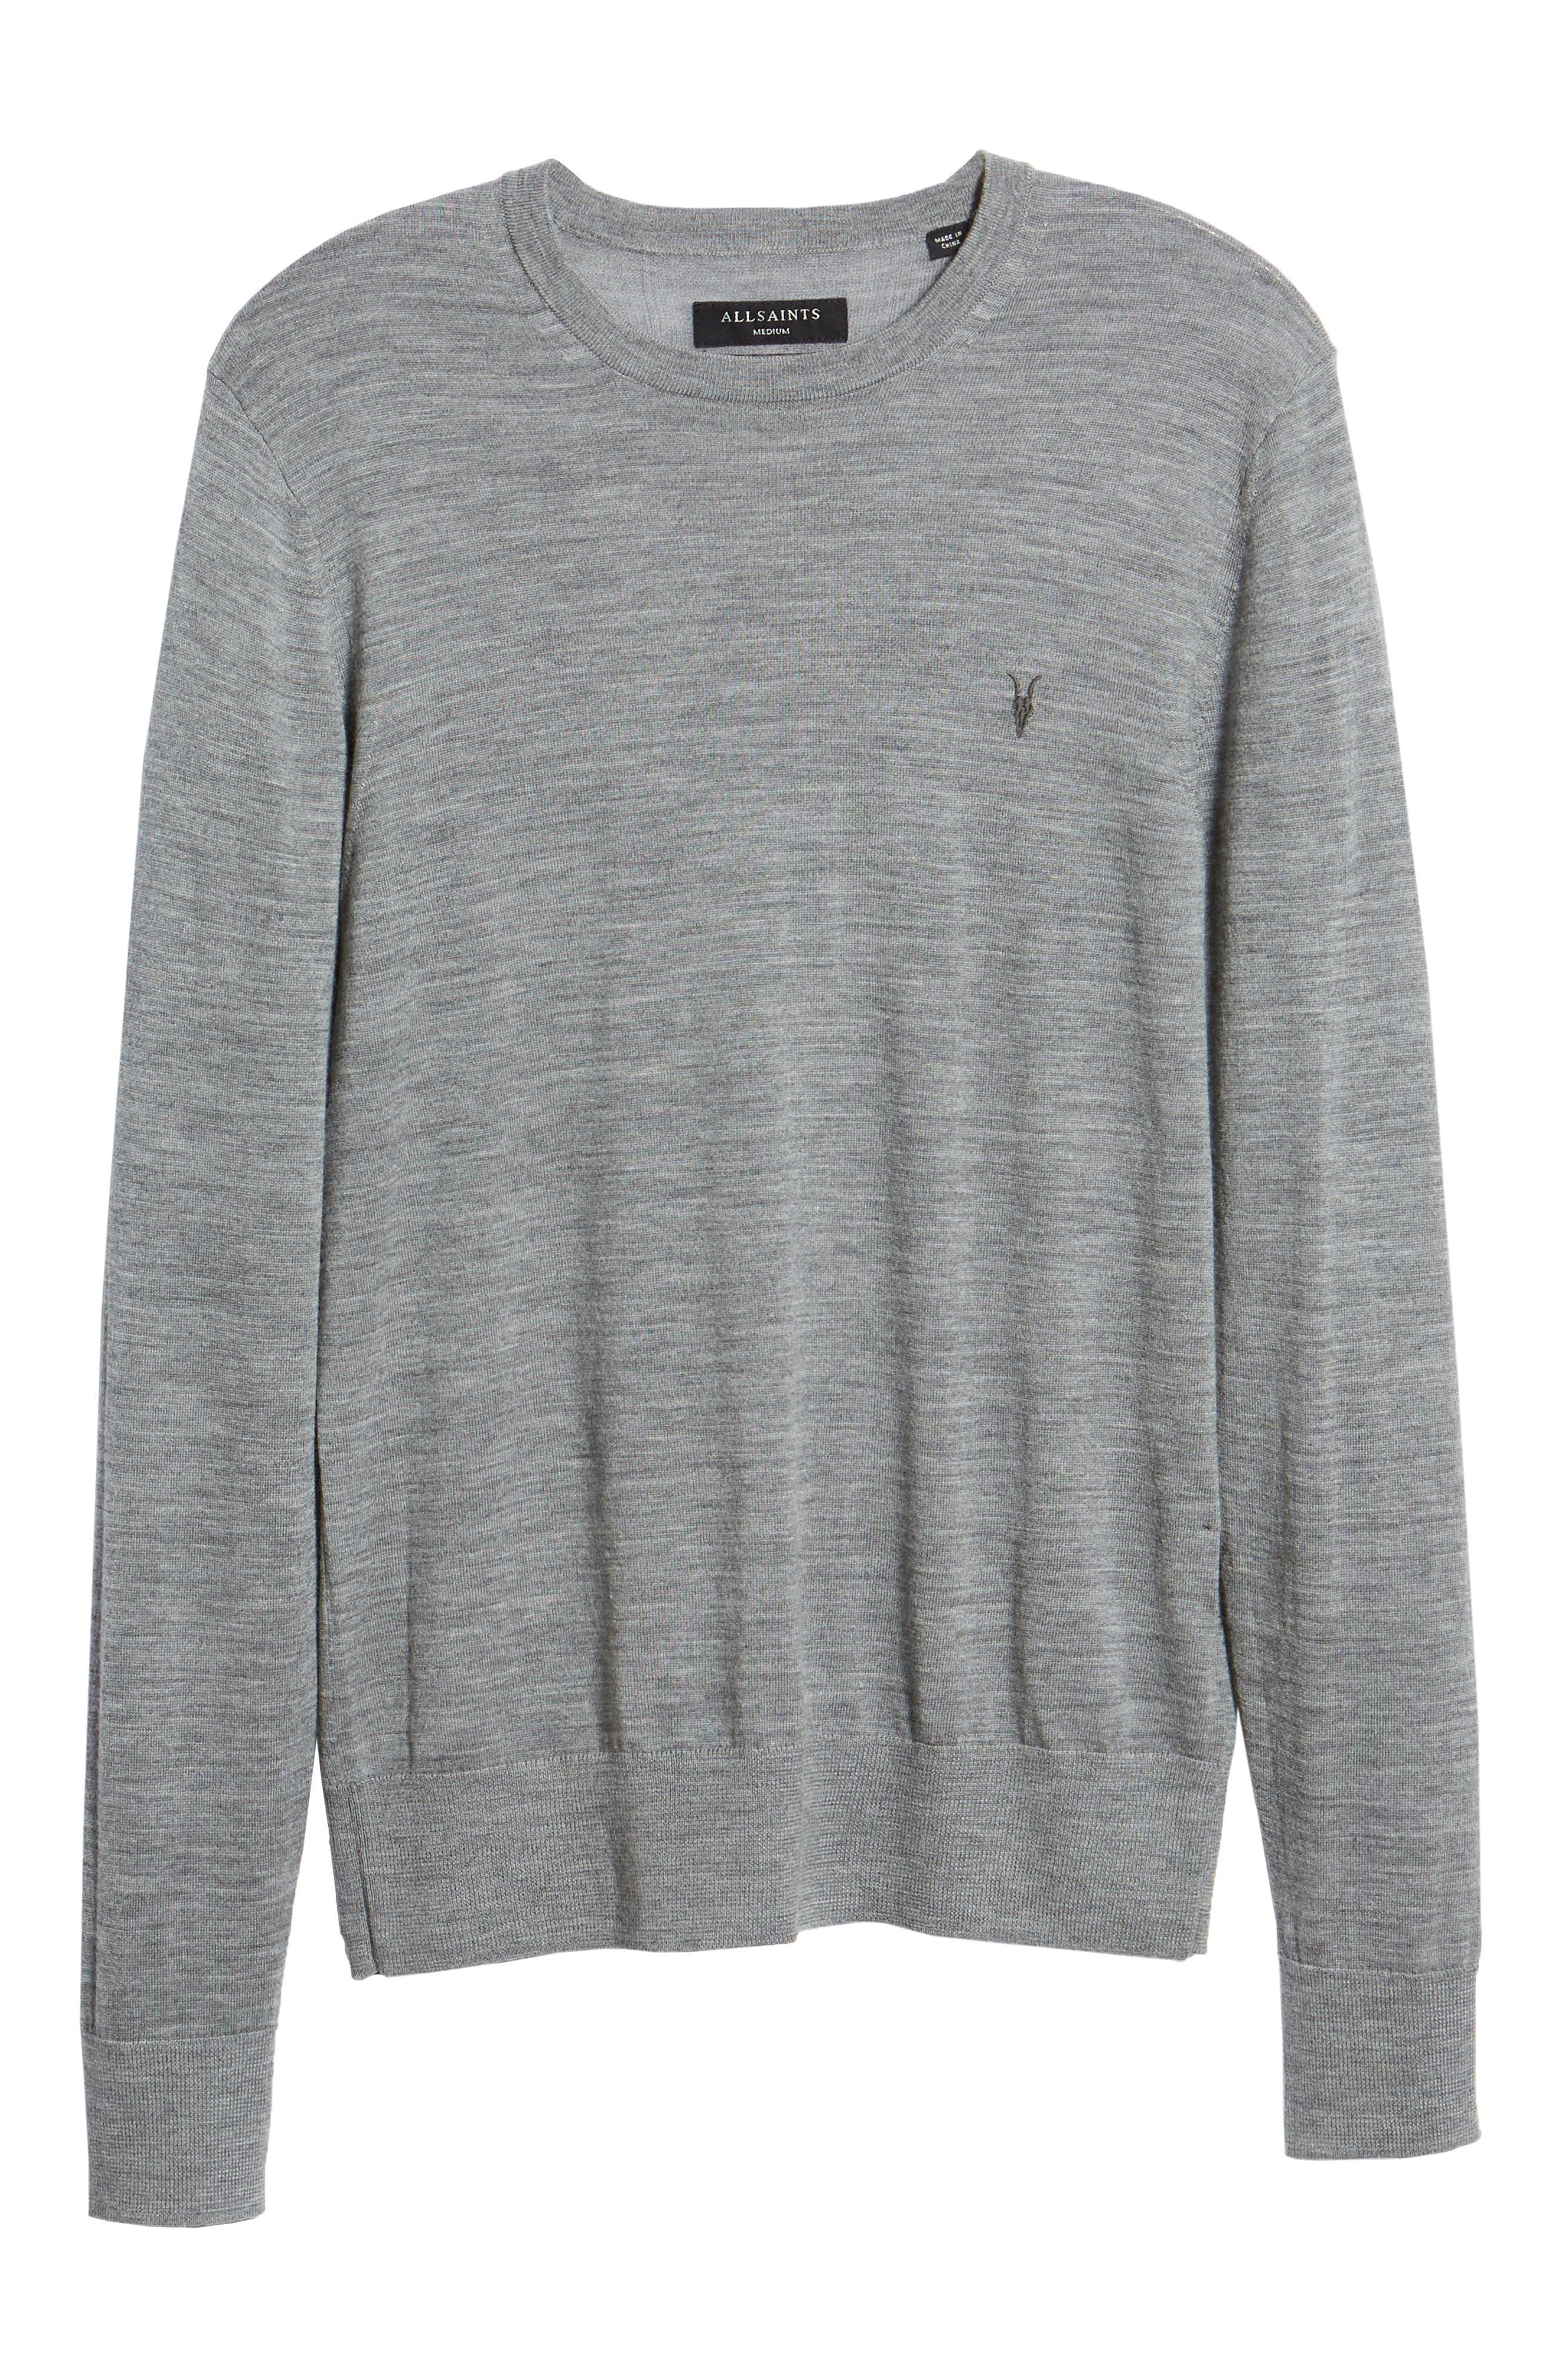 Mode Slim Fit Merino Wool Sweater,                             Alternate thumbnail 32, color,